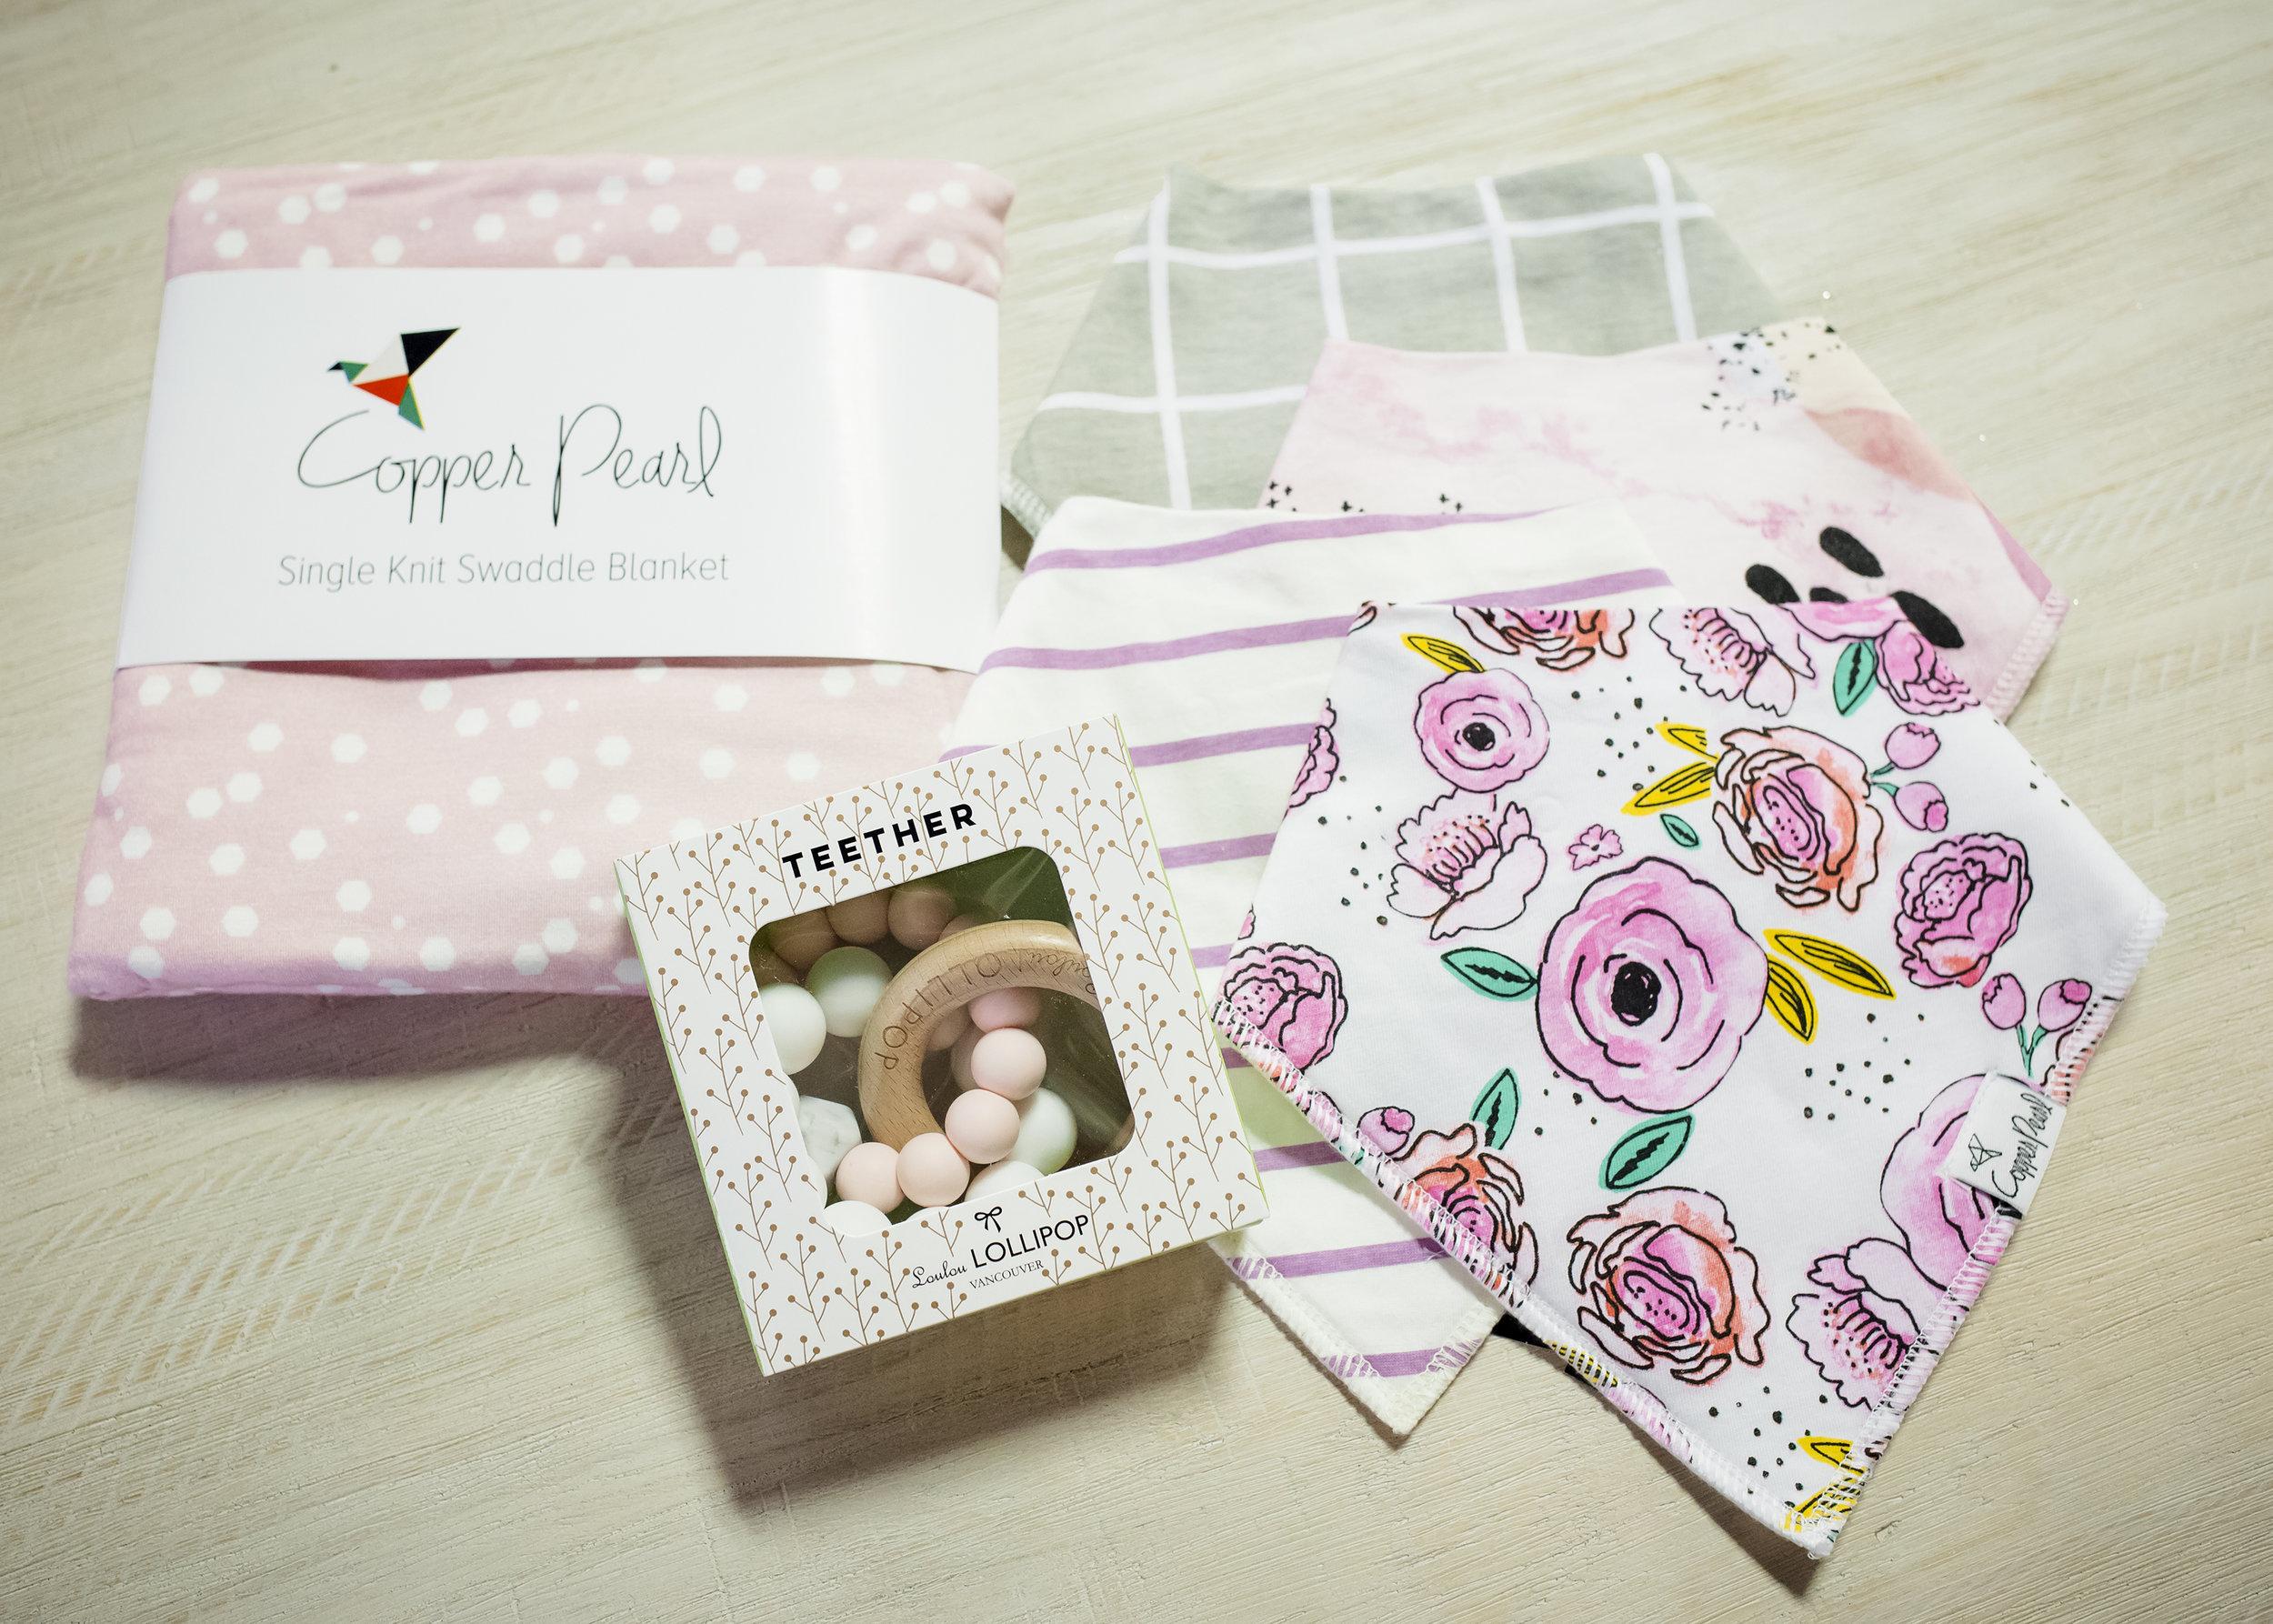 BABY GIRL - Loulou Lollipop Teether | $31Copper Pearl Bibs | $6.50 eaCopper Pearl Swaddle | $30